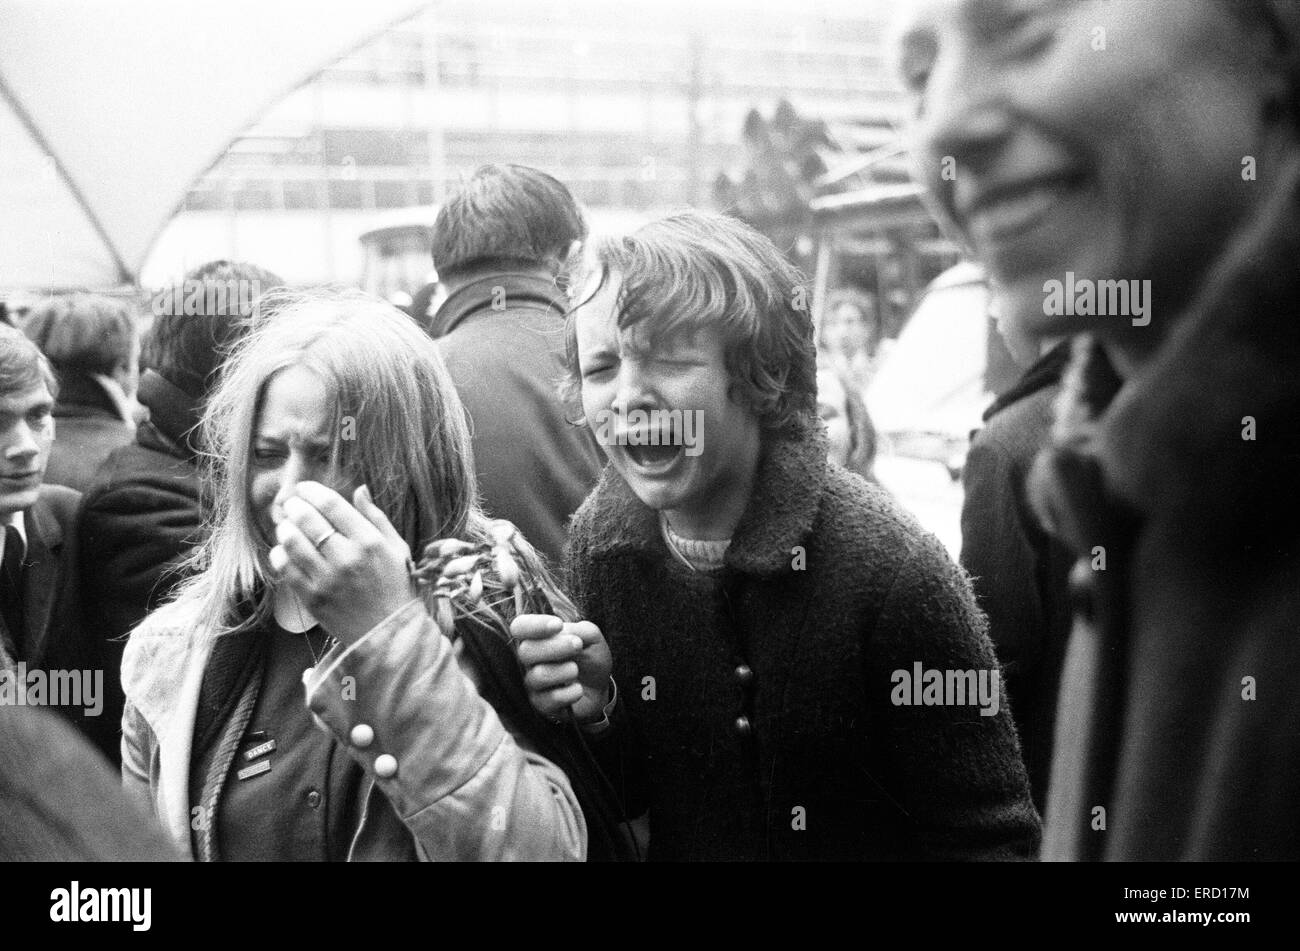 Civil Wedding of Paul McCartney & Linda Eastman, Marylebone Register Office, London, 12th March 1969. Stock Photo